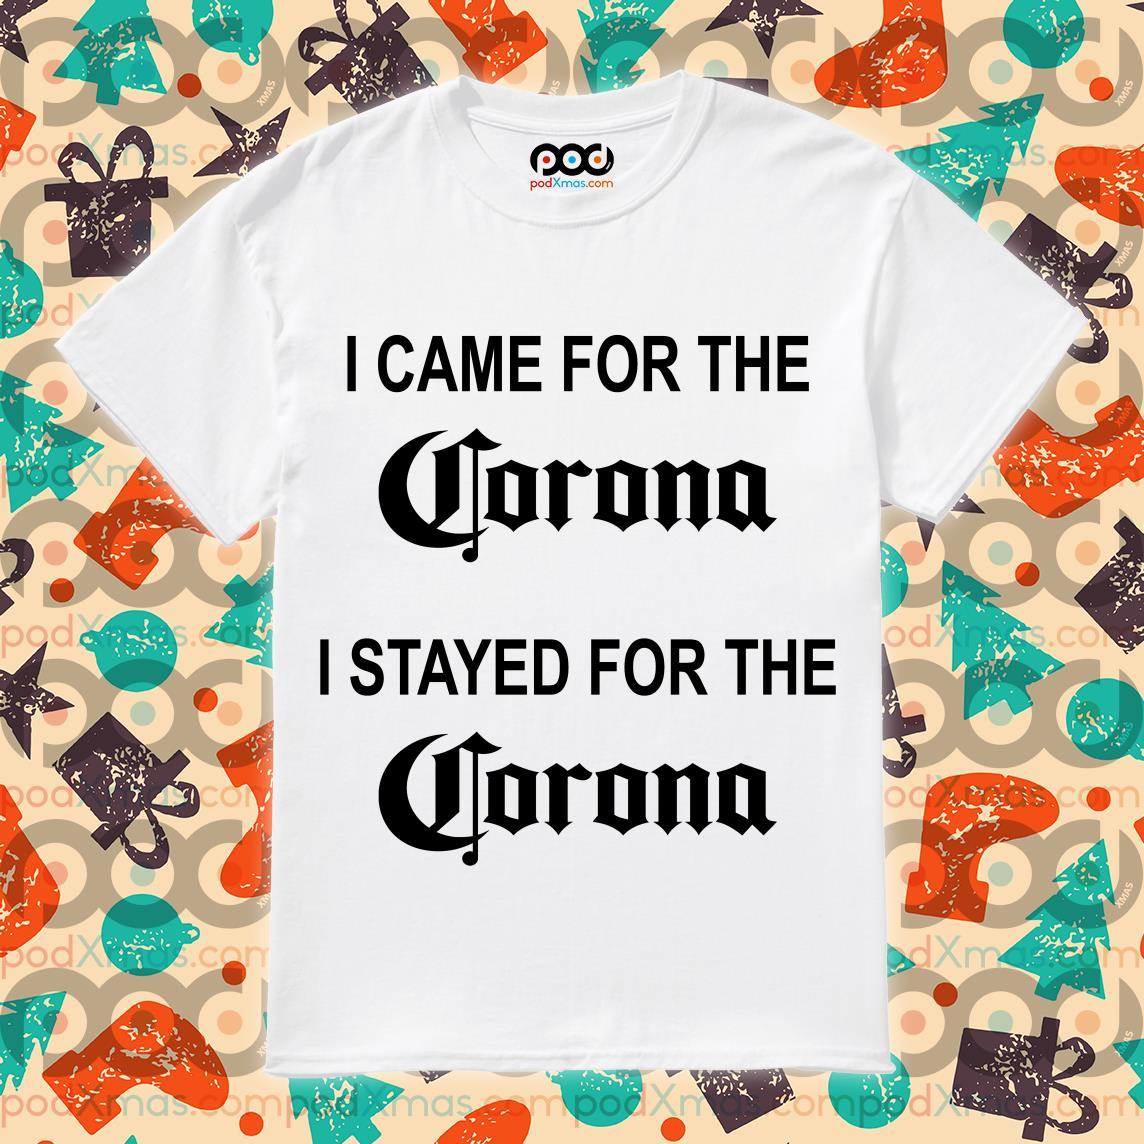 I came for the Corona I stayed for the Corona shirt